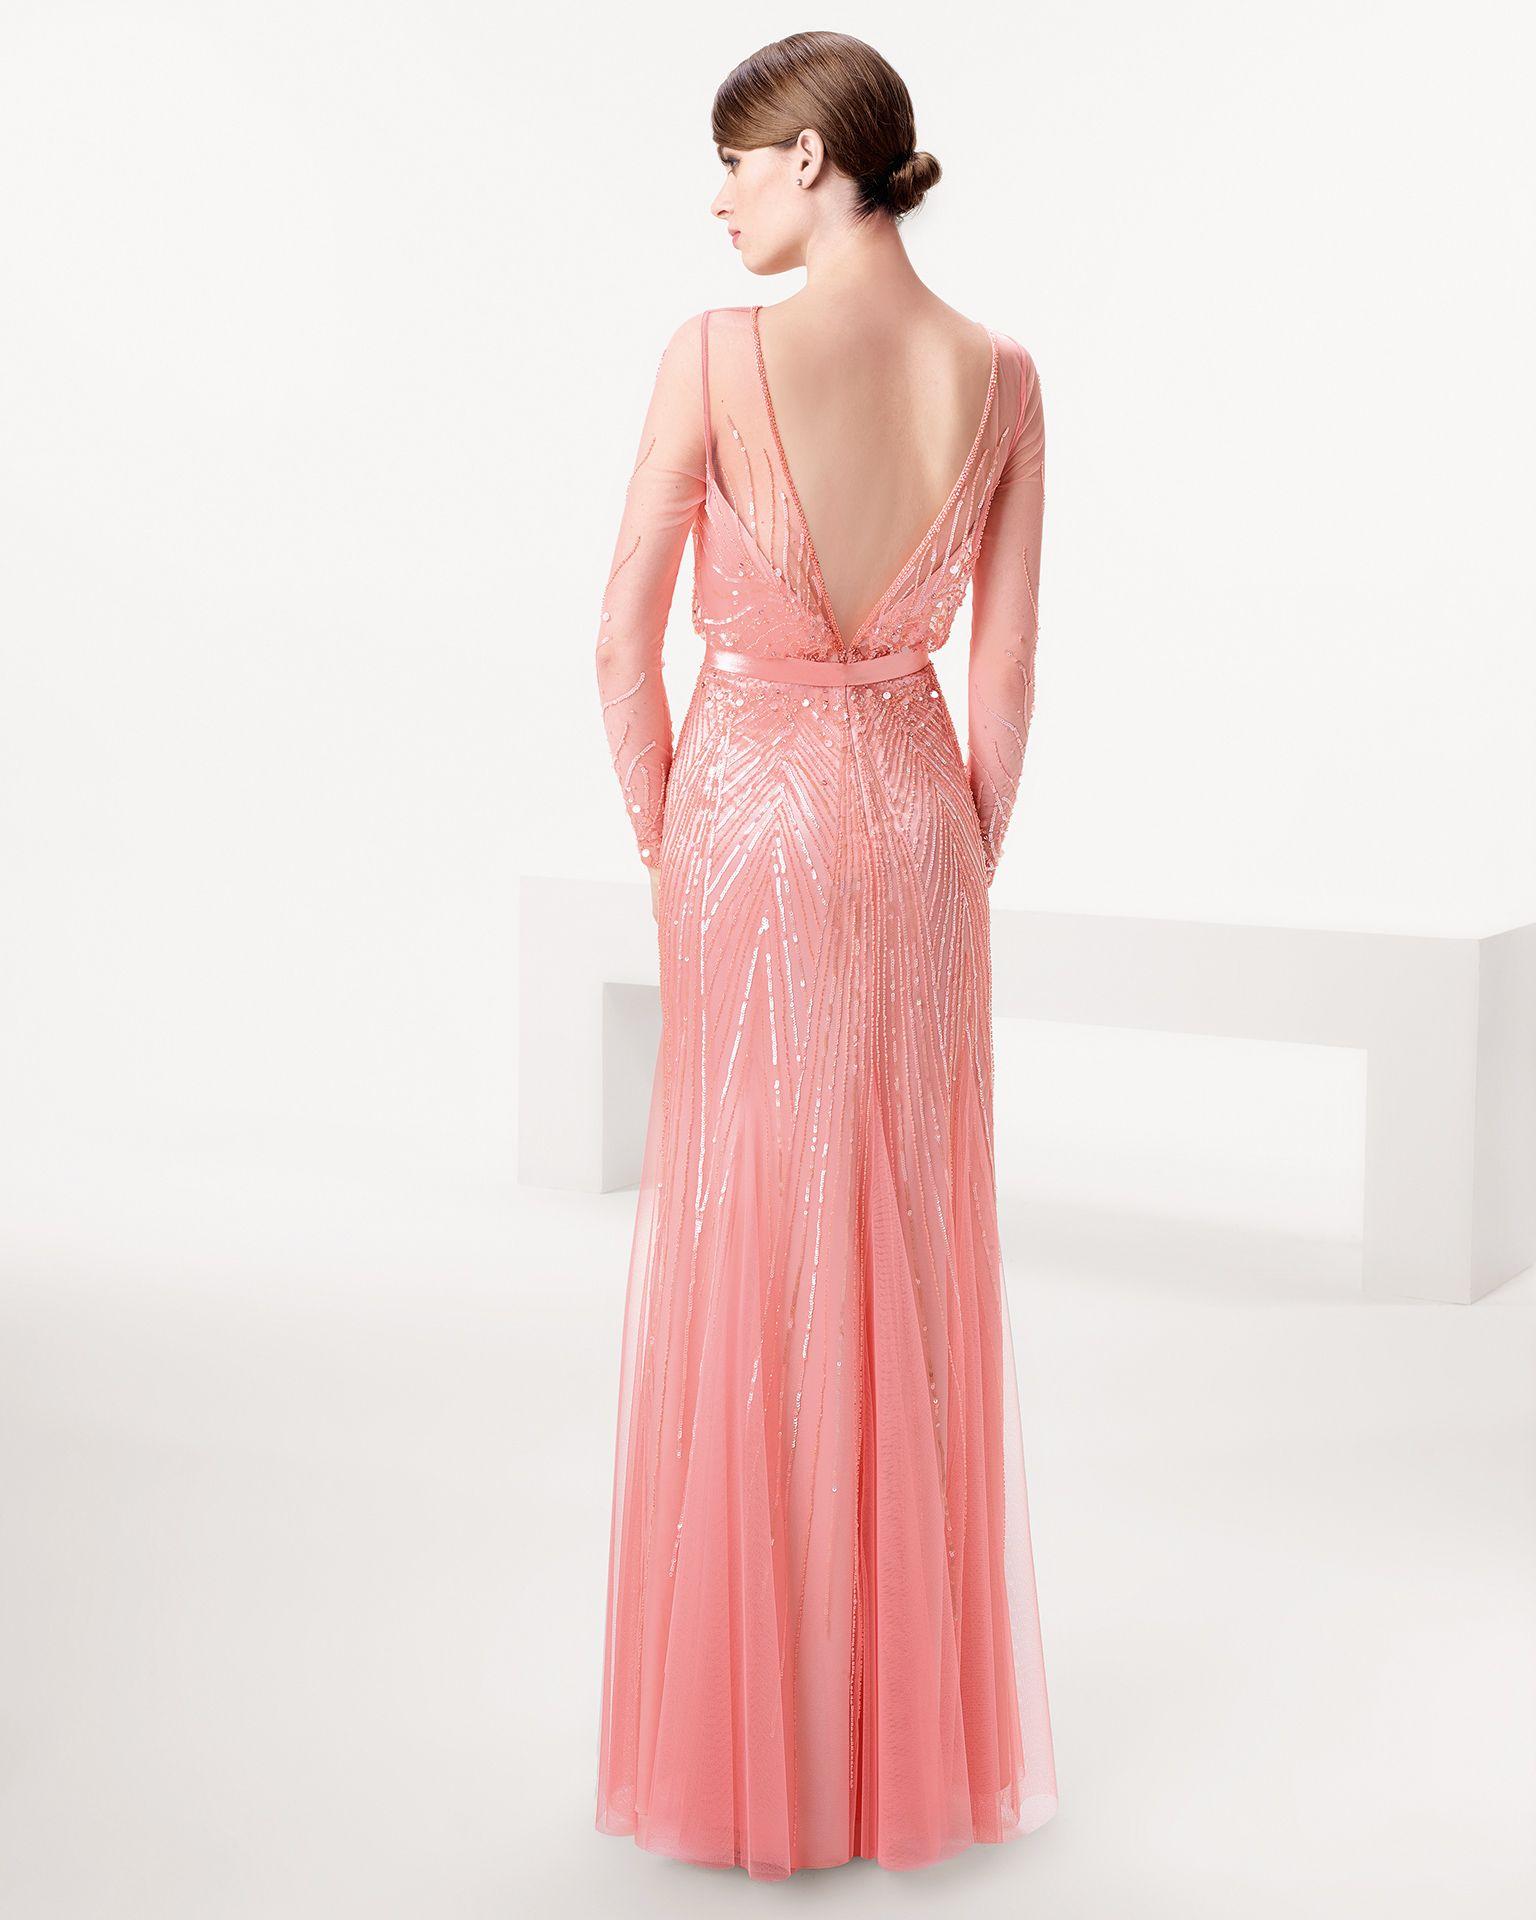 Vestido de fiesta Aire Barcelona largo | Gowns | Pinterest | Coral ...